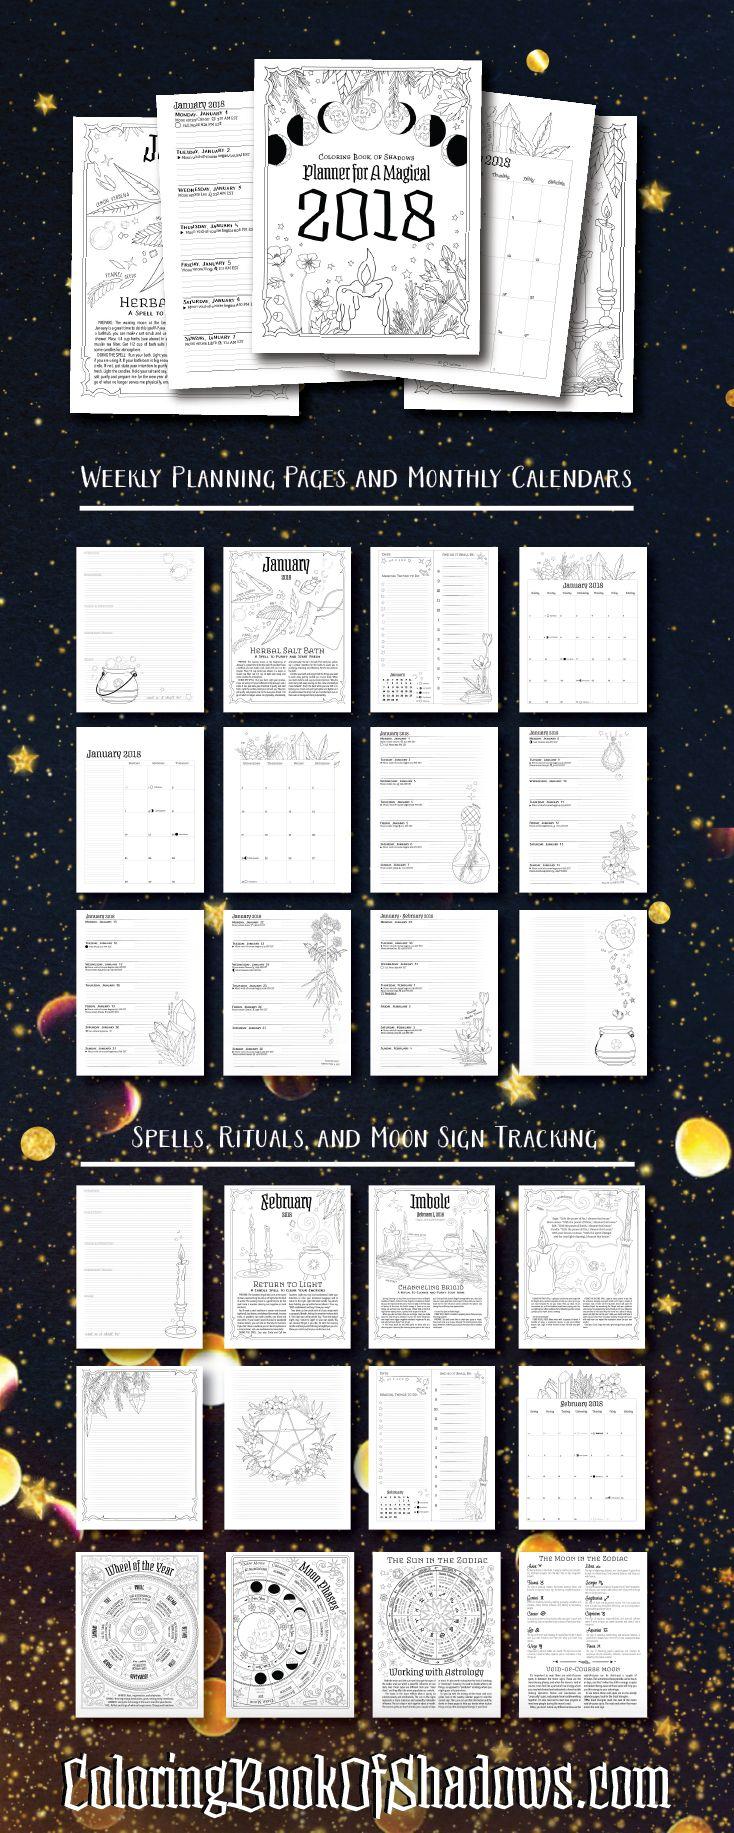 Planner For A Magical 2018 Printable PDF RAndoM Stuffs